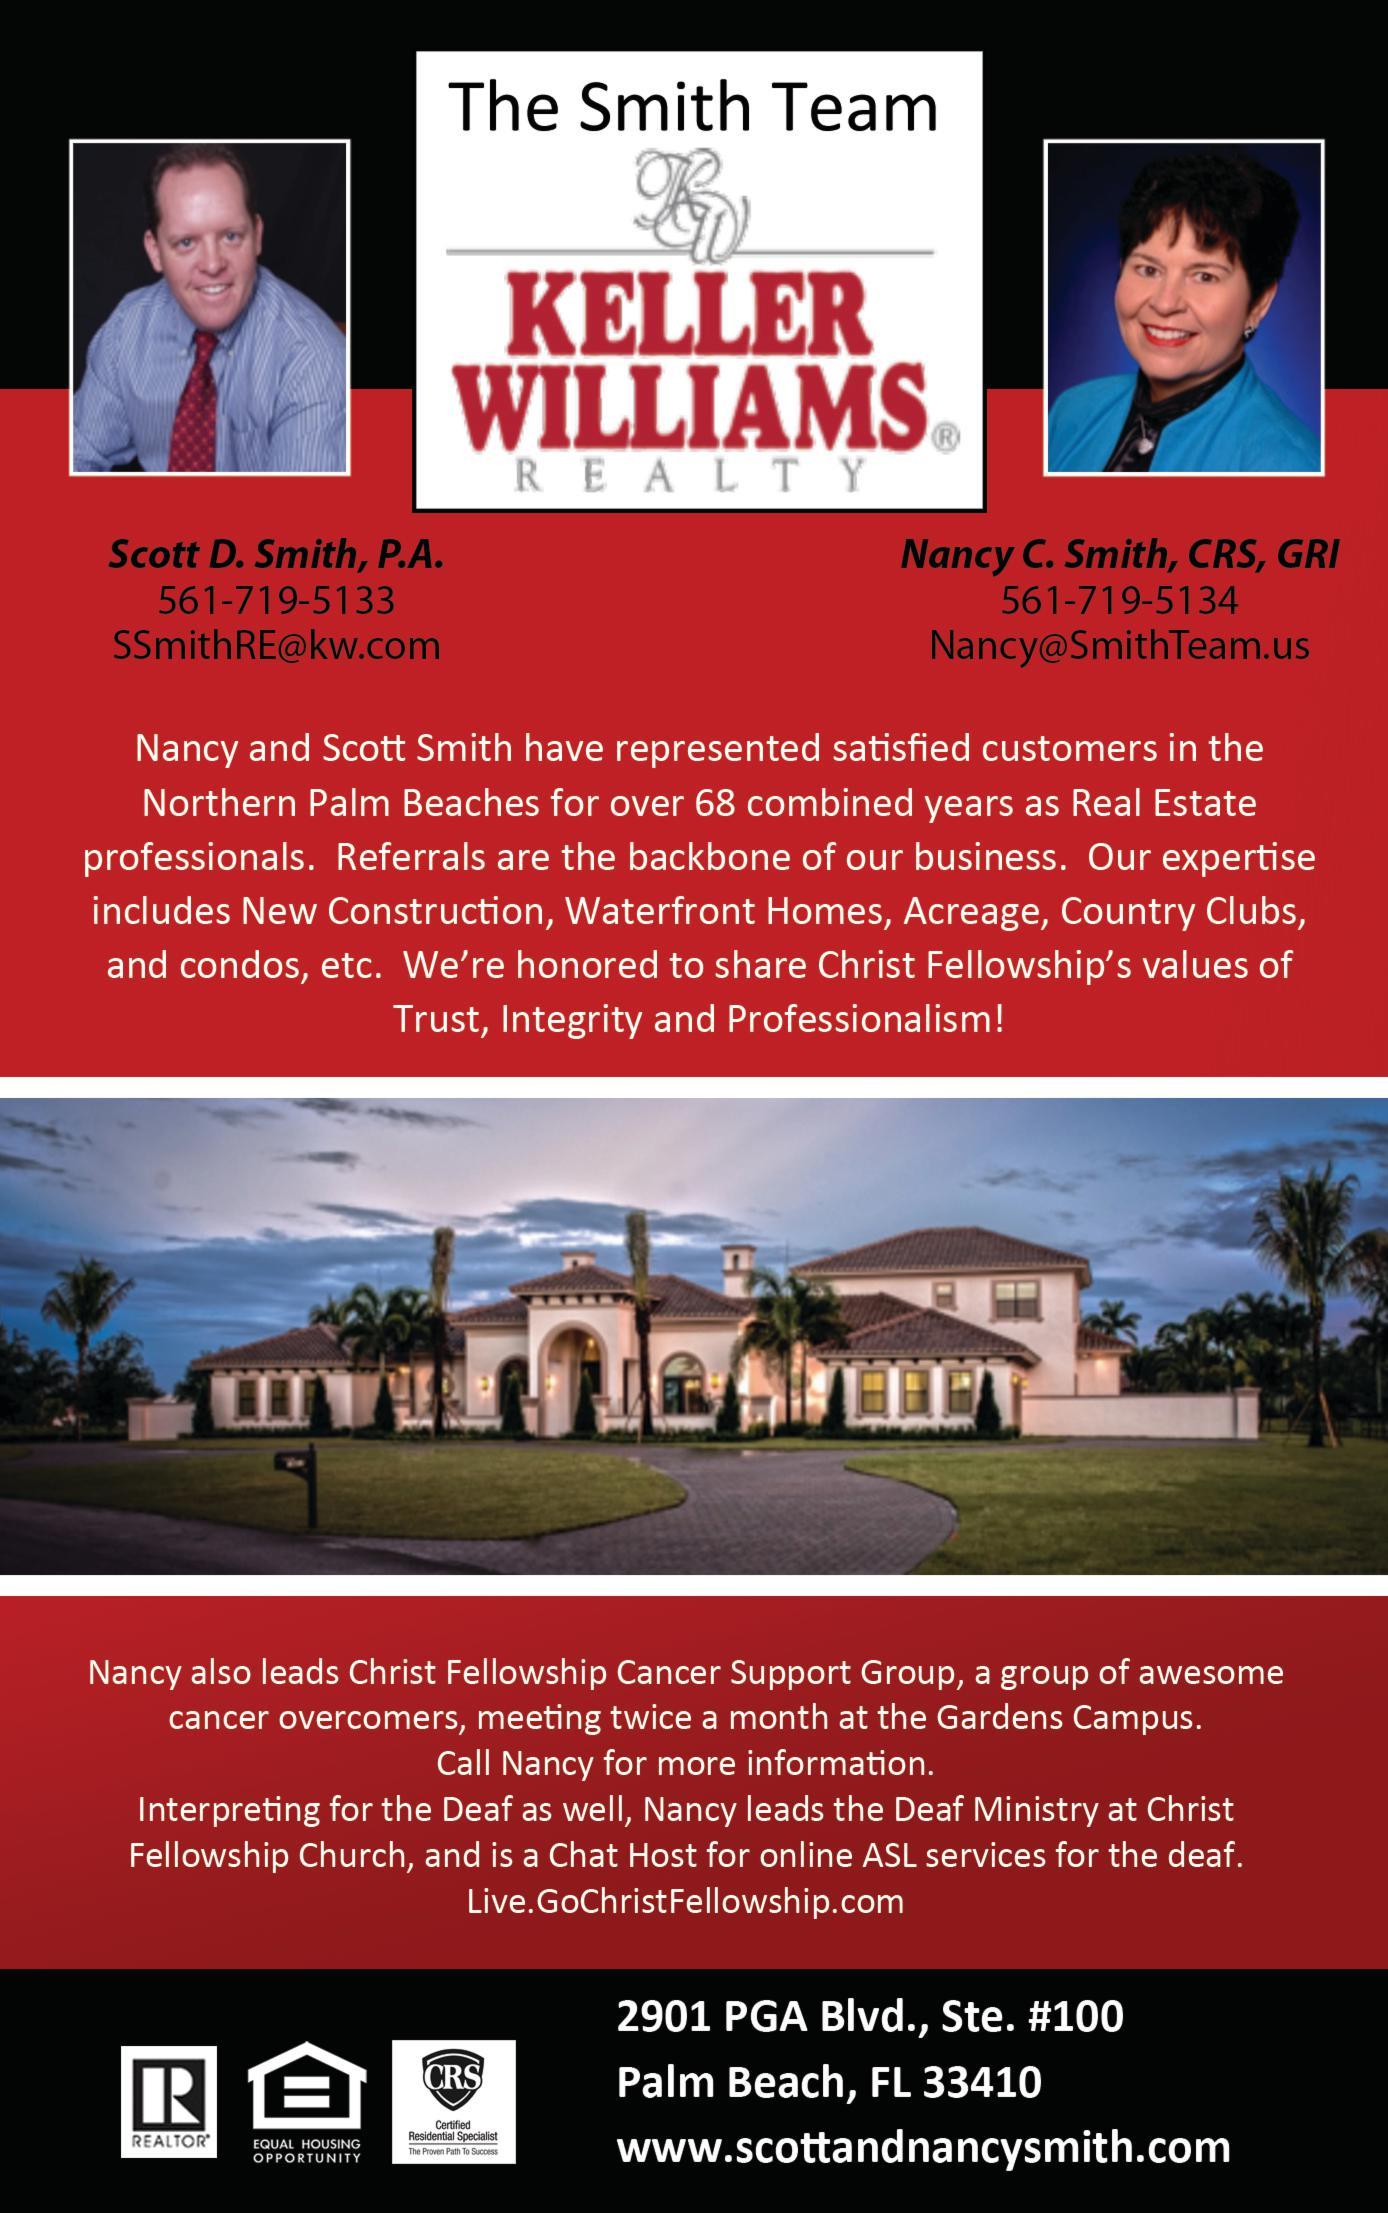 Keller Williams Realty - Smith